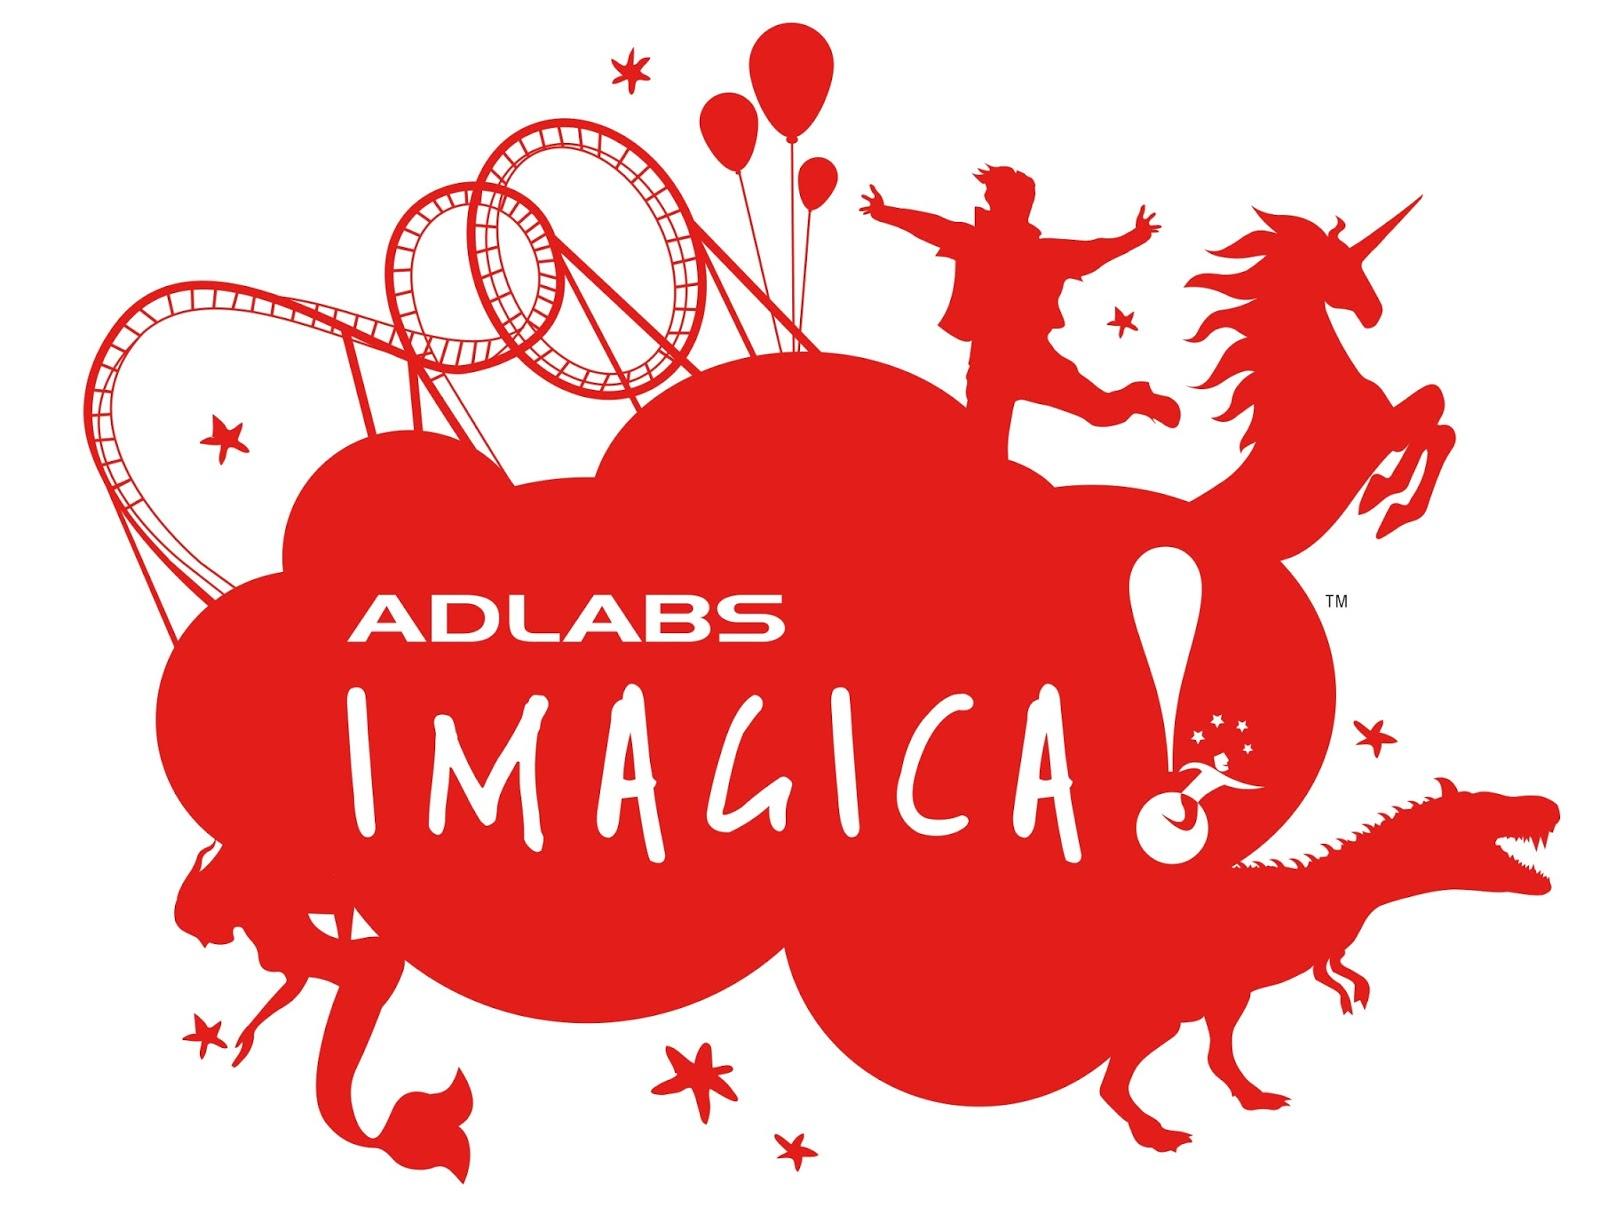 Adlabs Imagica Ticket, Imagica Tour Package, Imagica Tour Operator, Hotel Booking near imagica park, imagica bus ticket, aksharonline.com, www.aksharonline.com, 8000999660, 9427703236